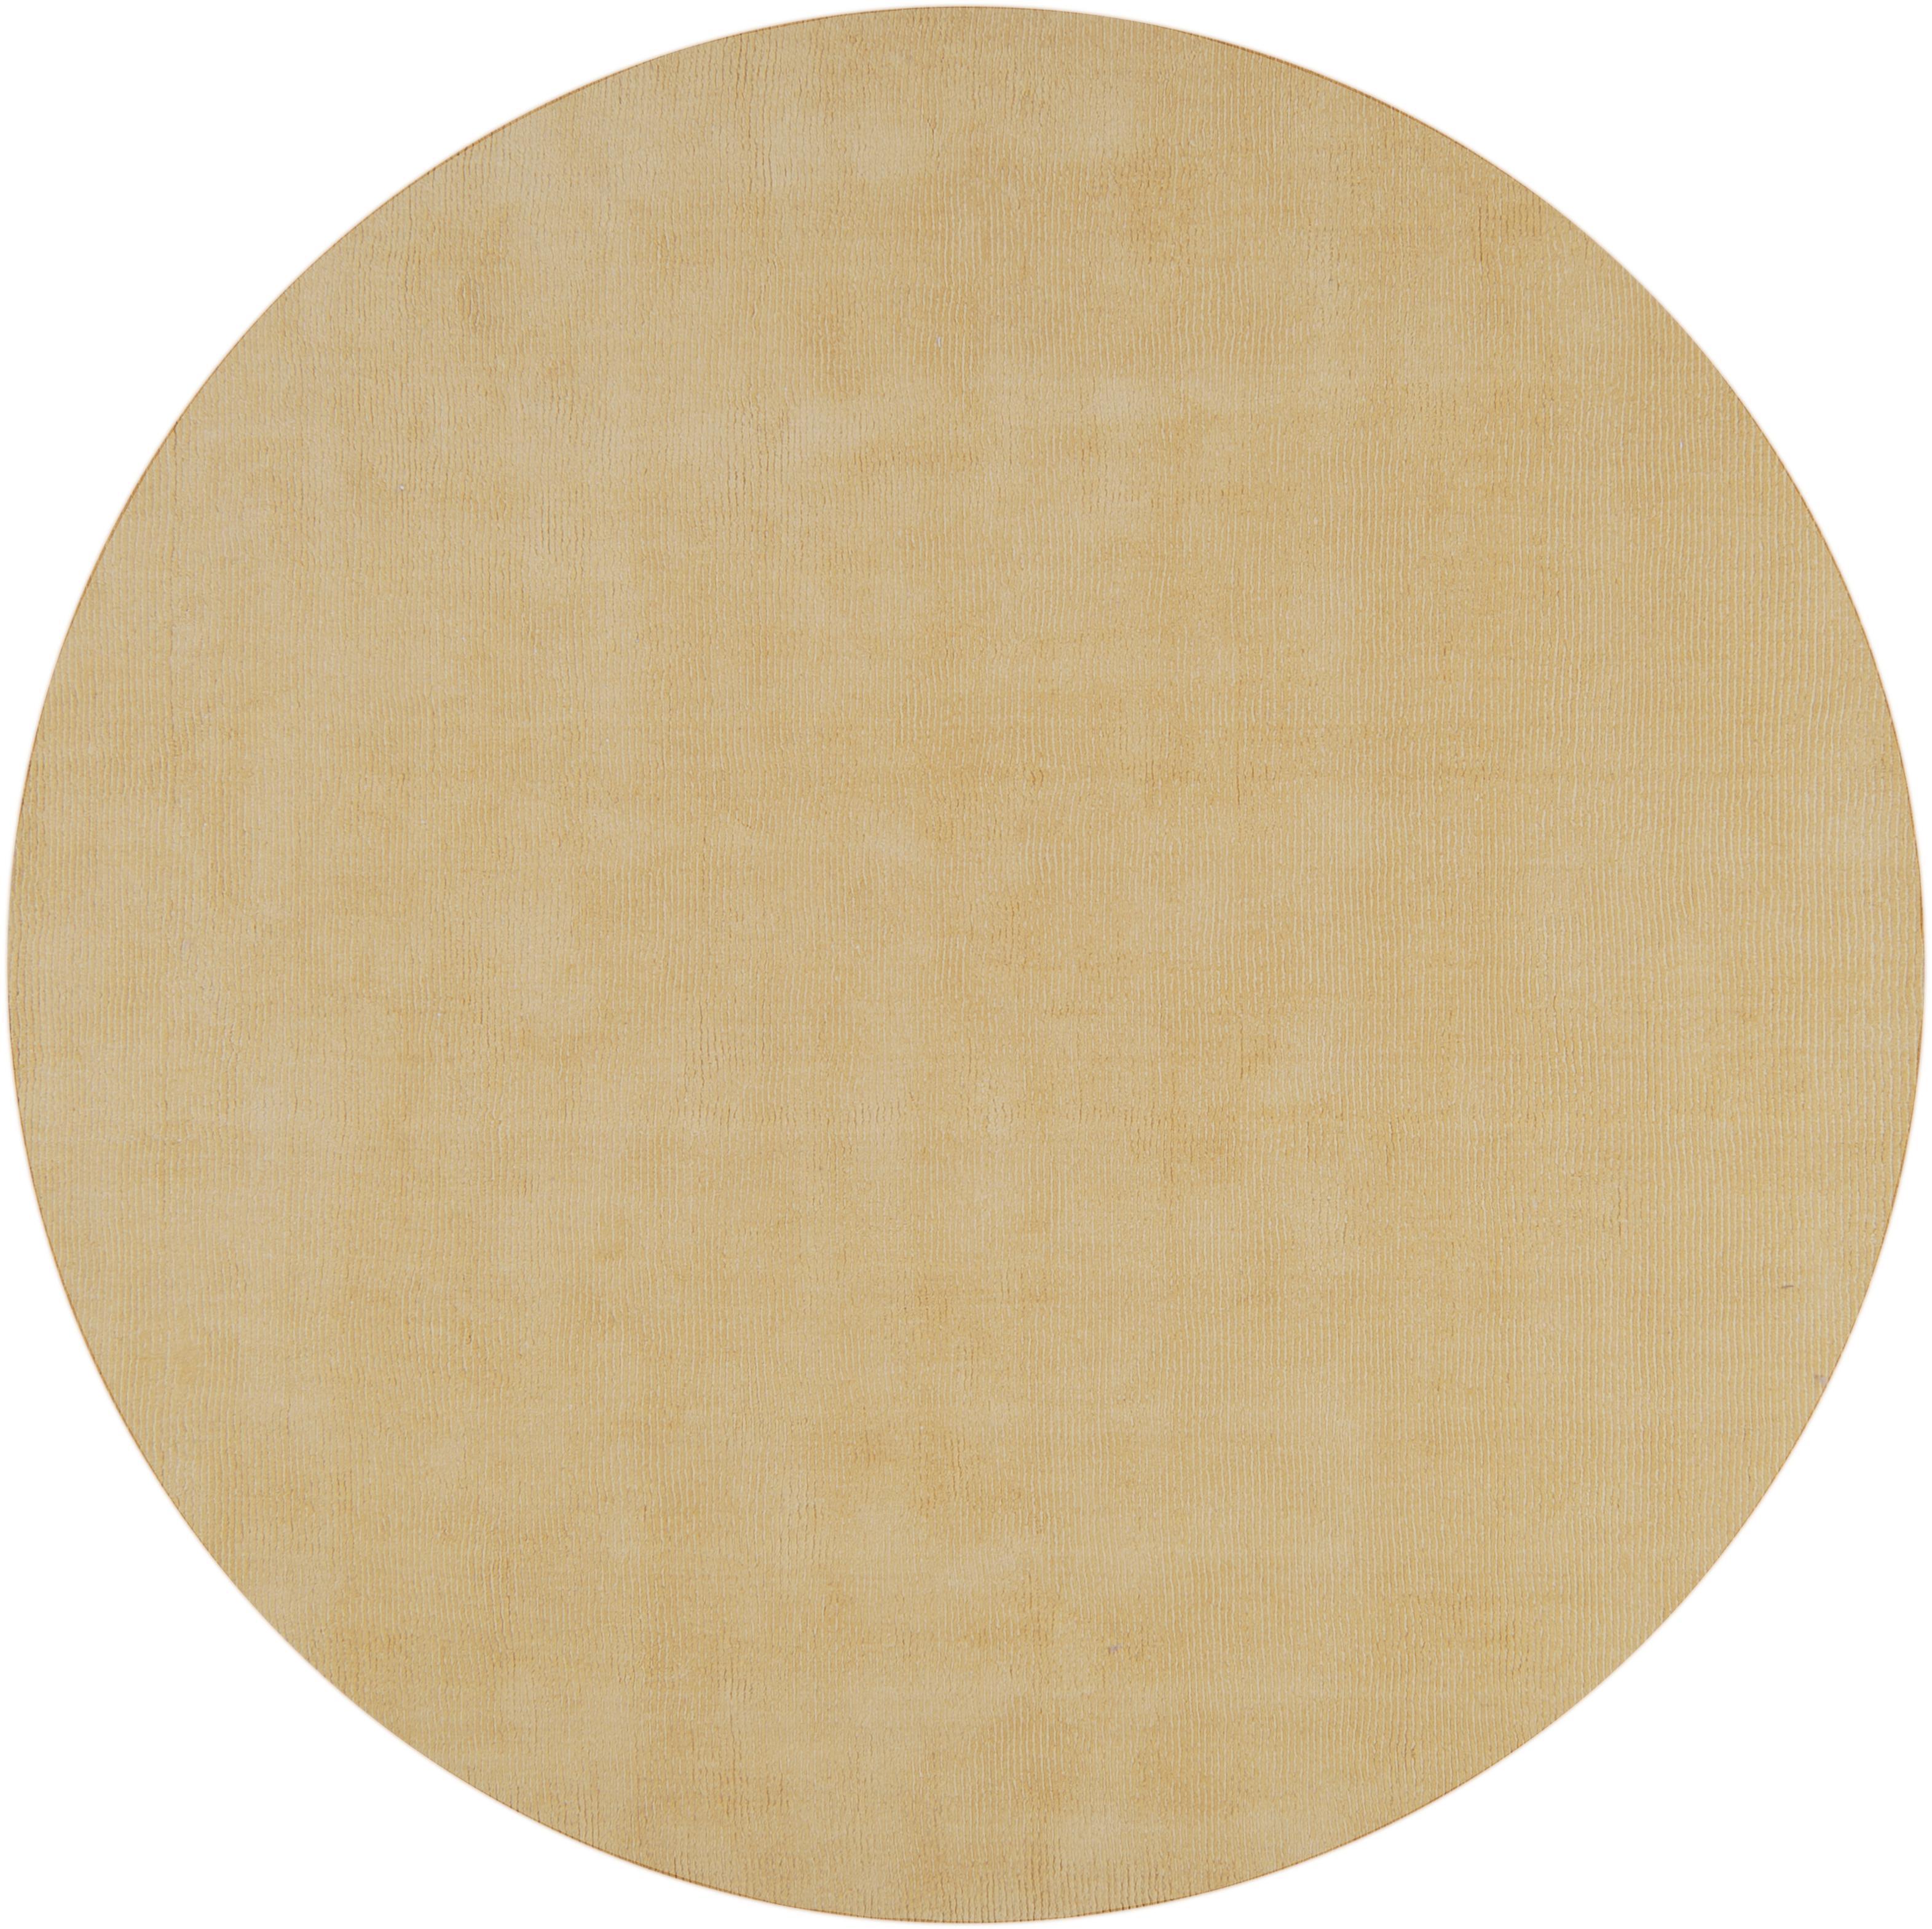 Surya Rugs Mystique 8' Round - Item Number: M327-8RD